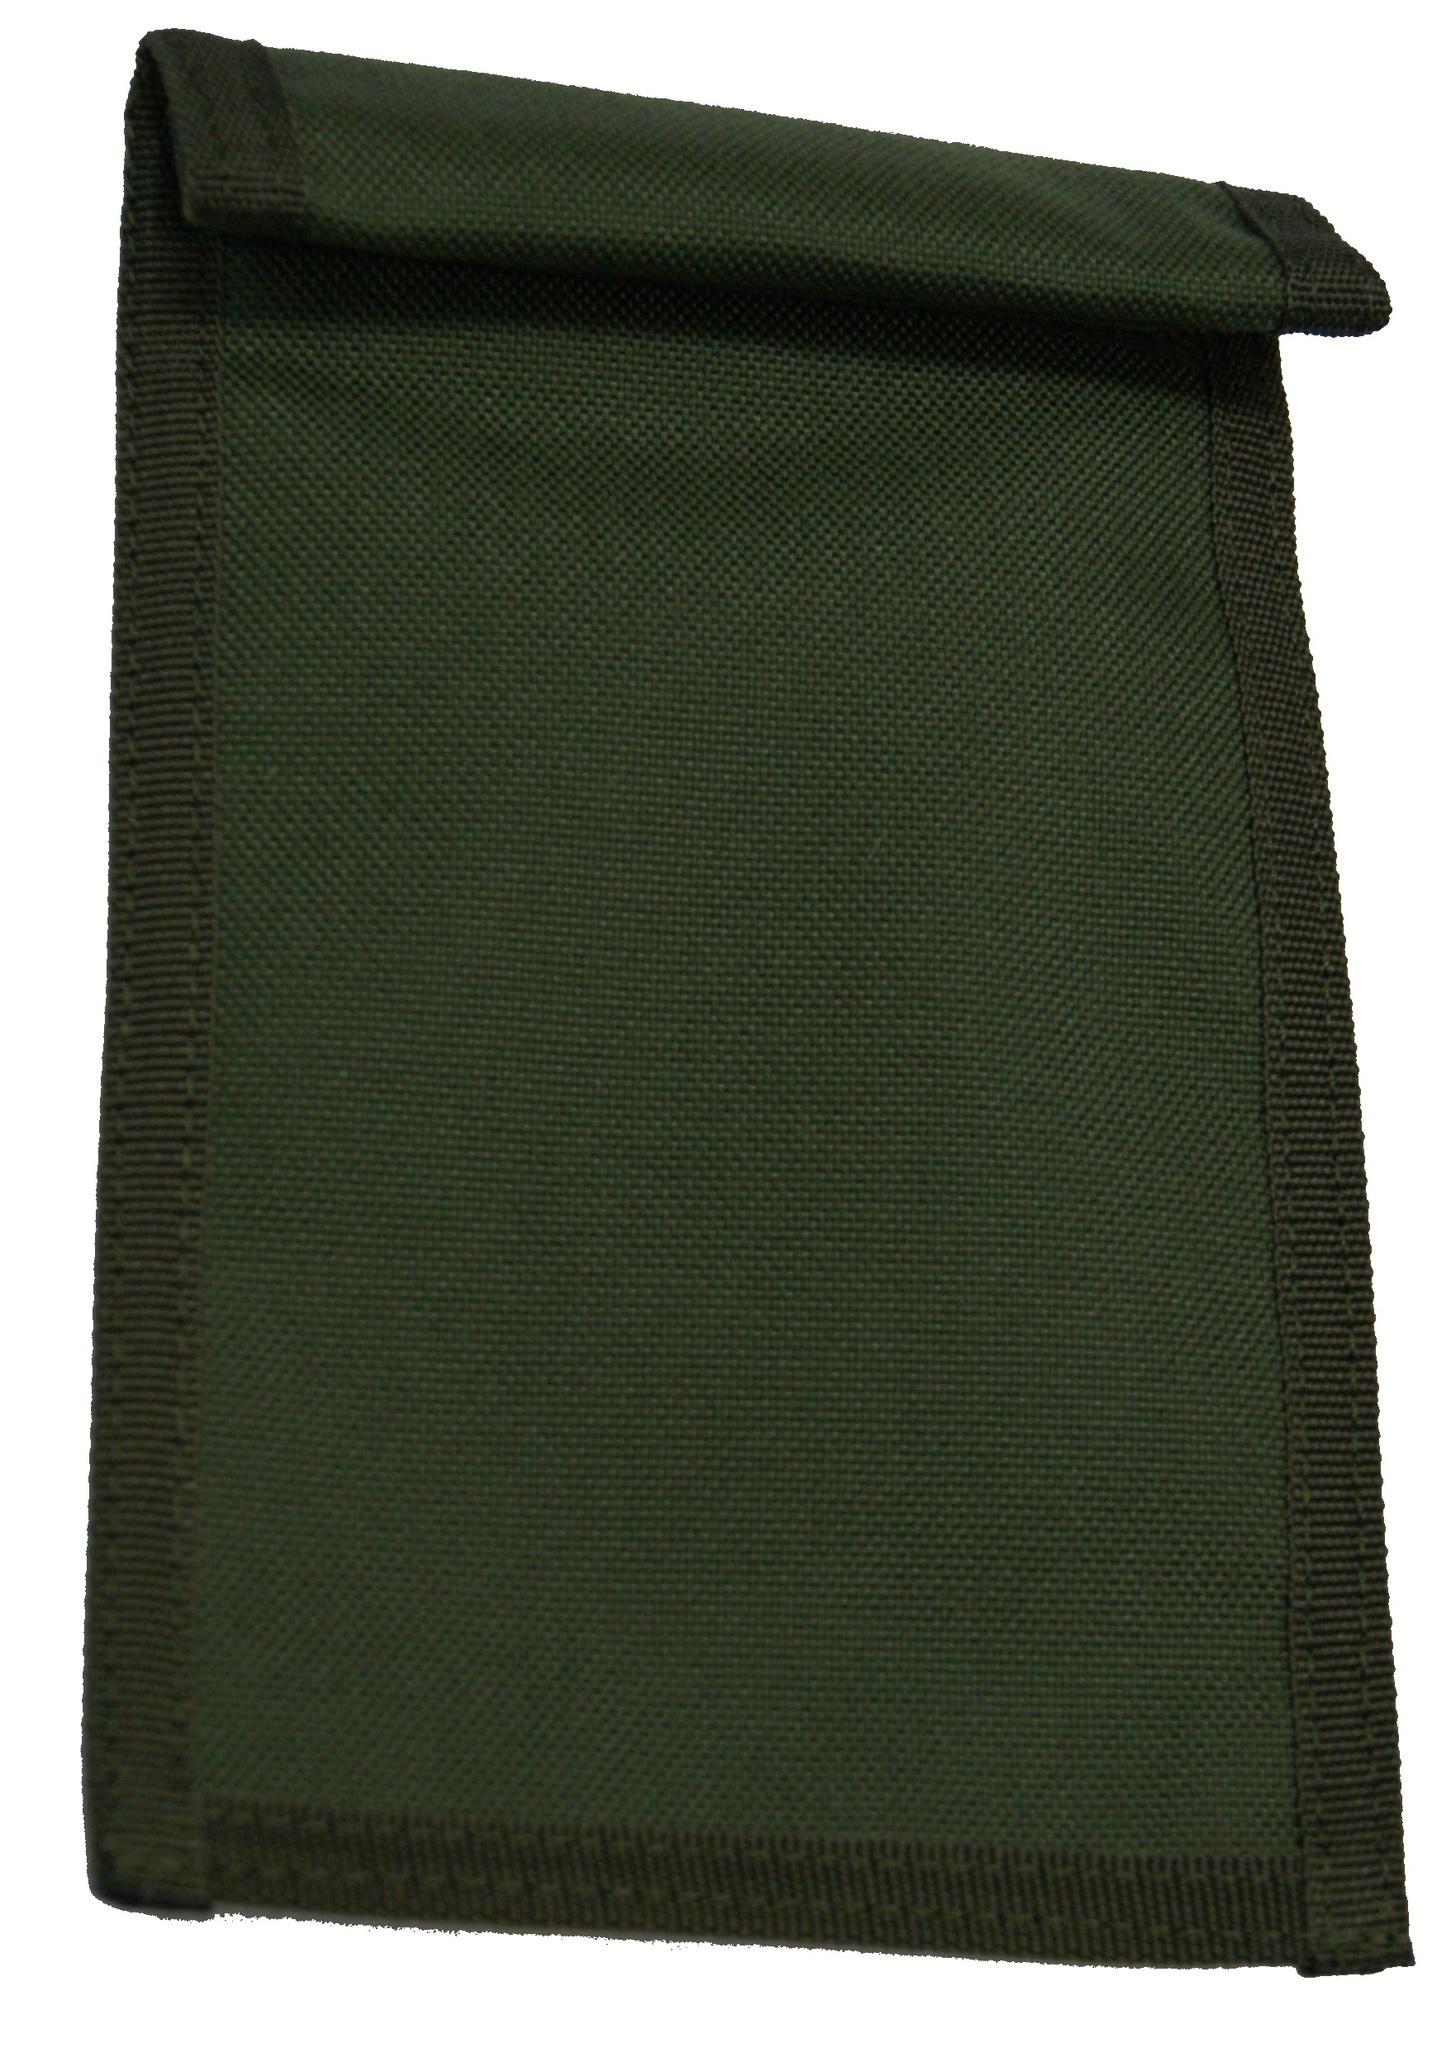 Чехол для телефона RadioBlock Case AVP, 12х26 см